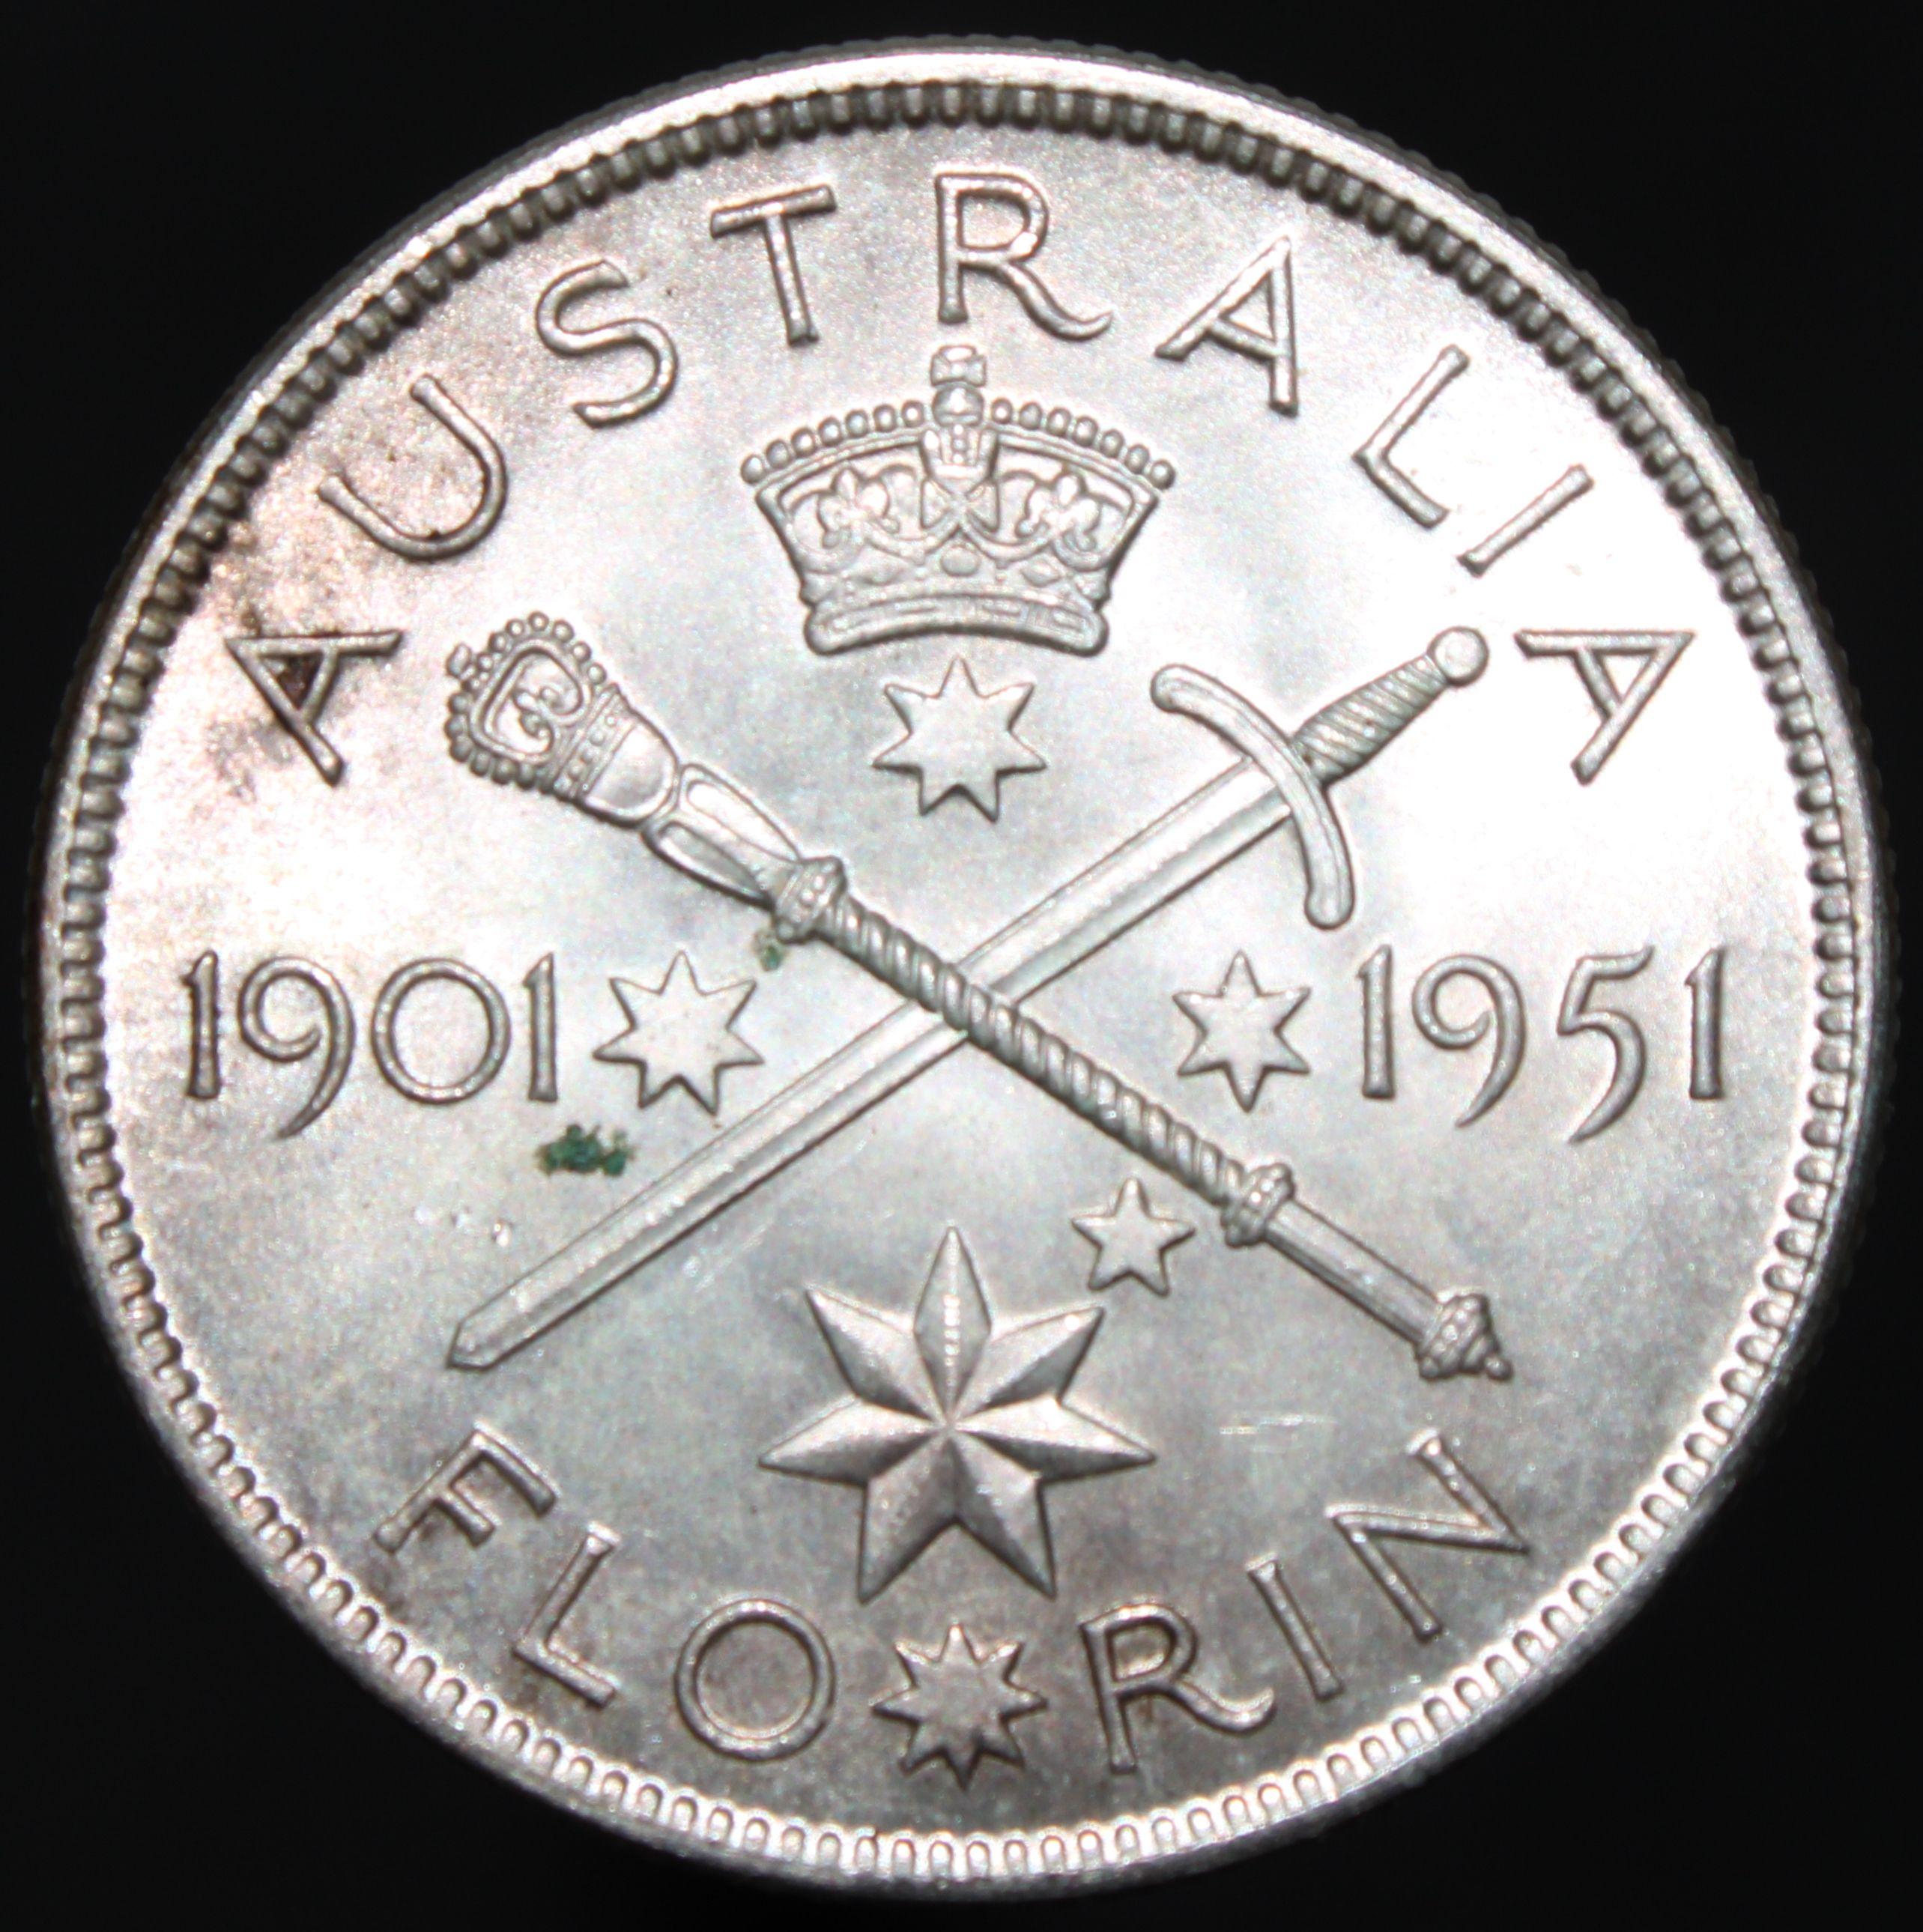 1951 Australia Florin Silver Coins KM Coins